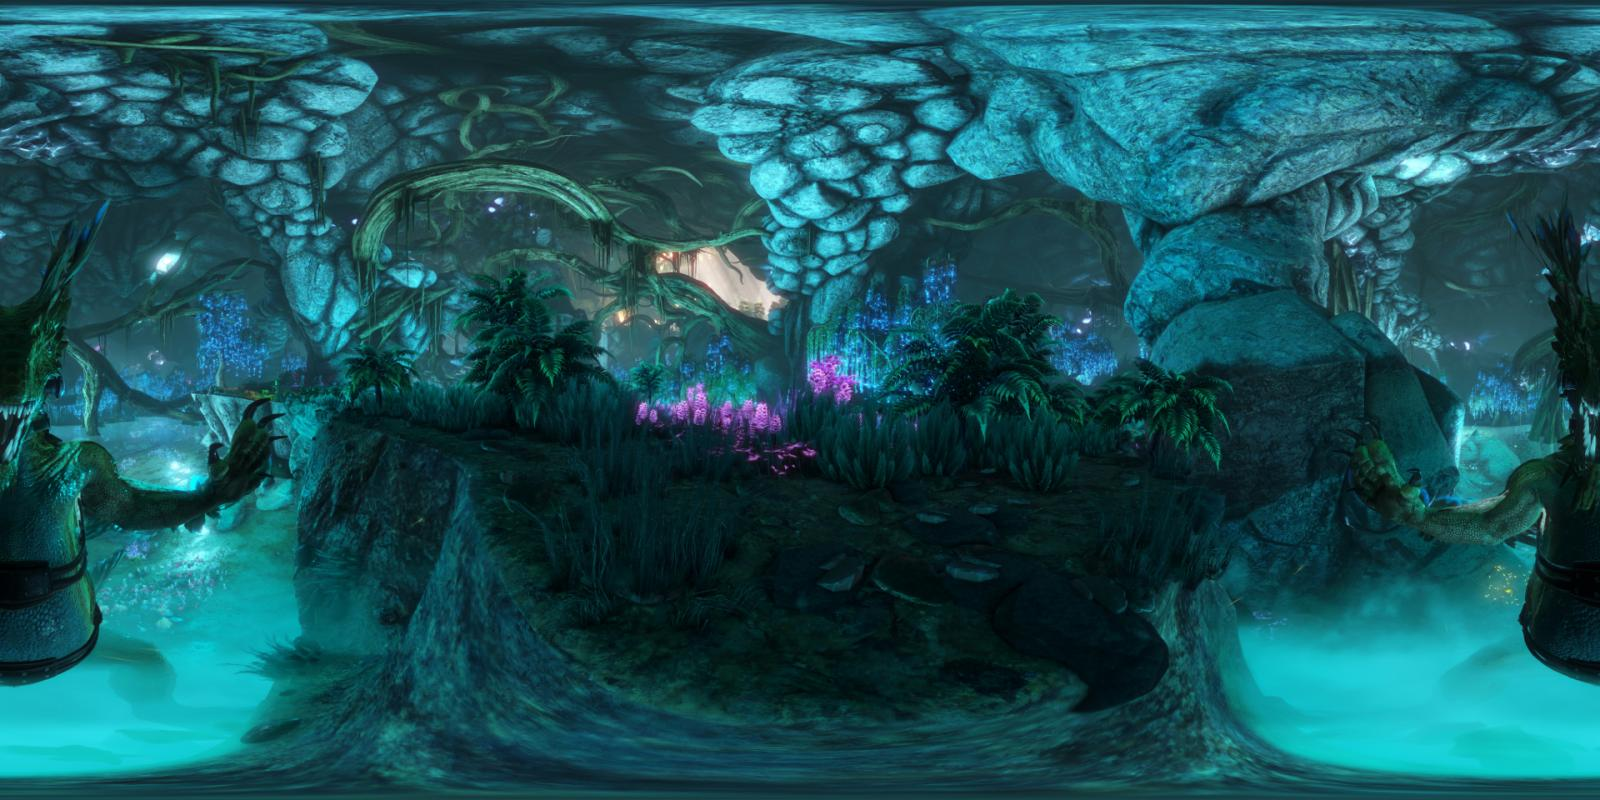 large.5a62baa625683_VakarianHappyRockDrake-Panoramic360Steroscopic3D.jpg